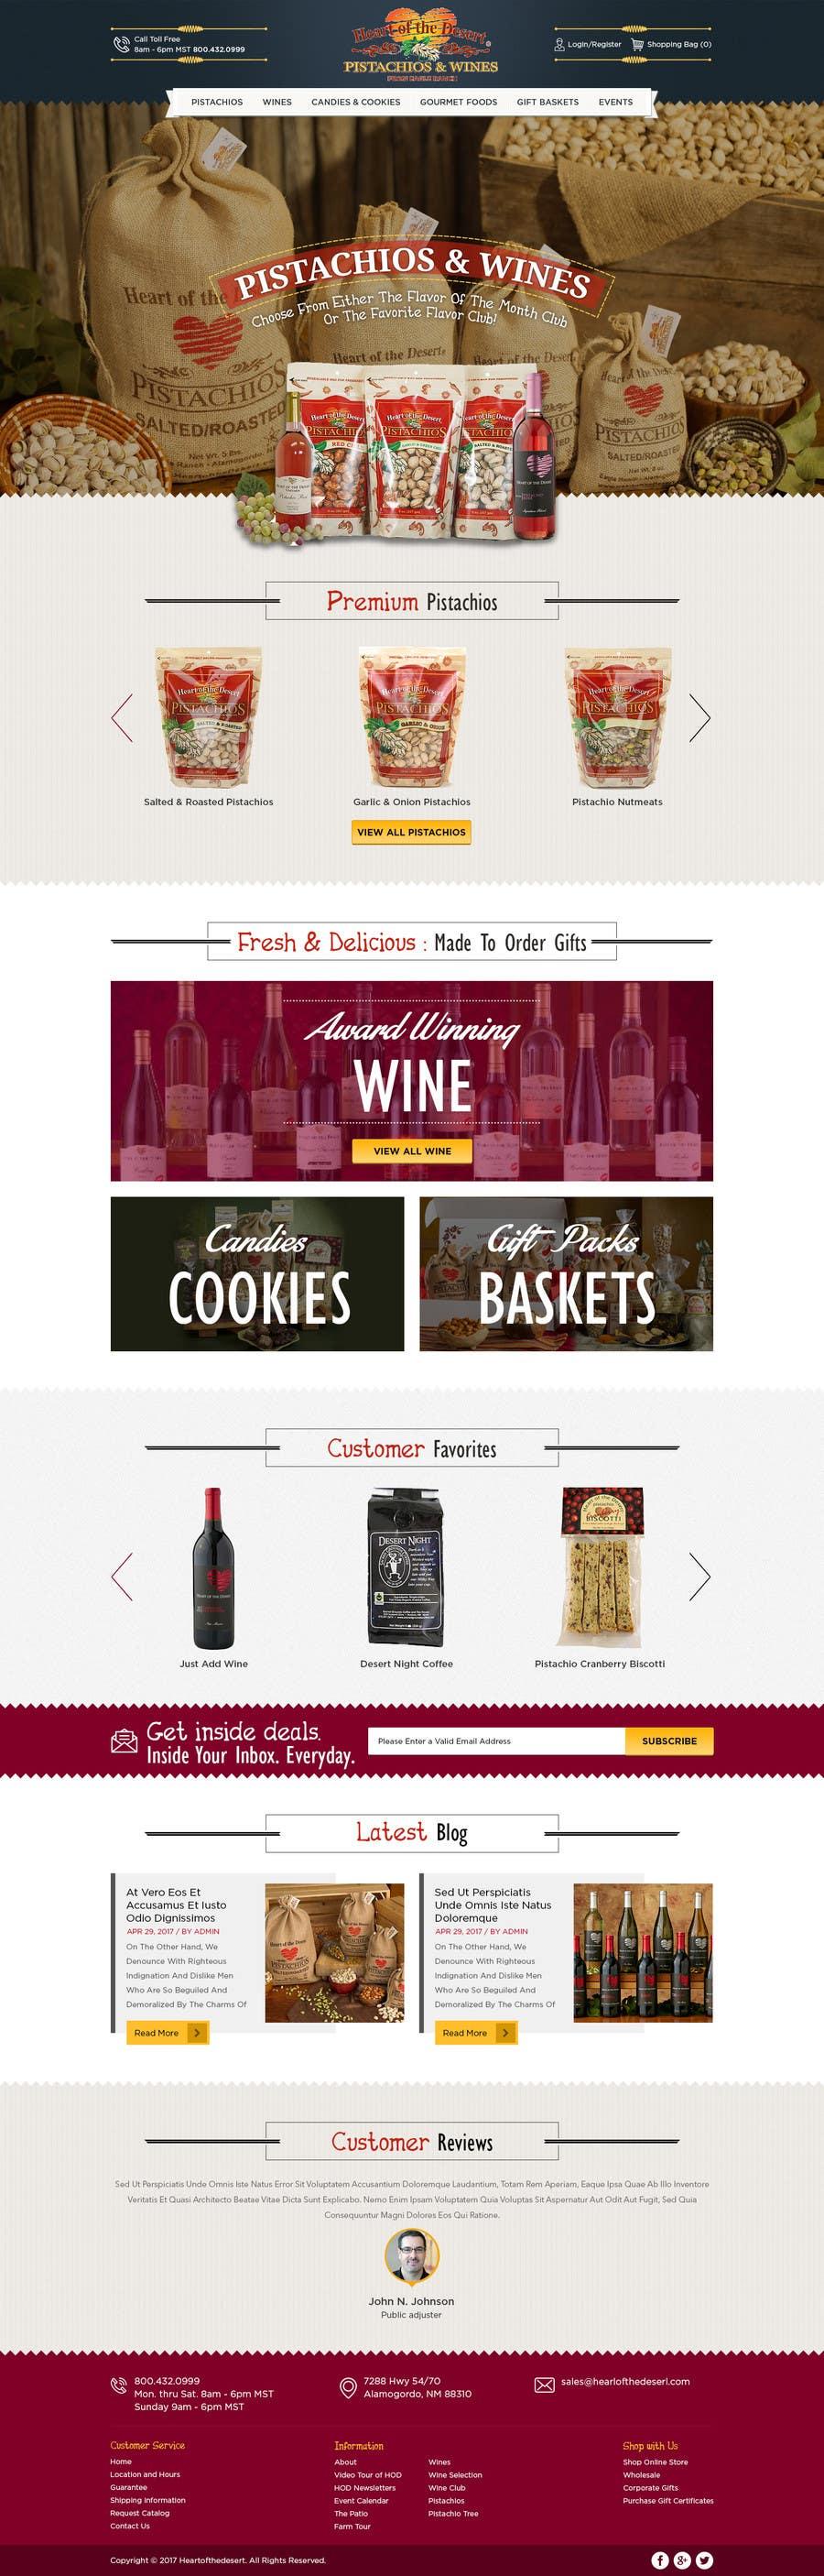 Proposition n°2 du concours Design a Website Mockup for E-commerce Site